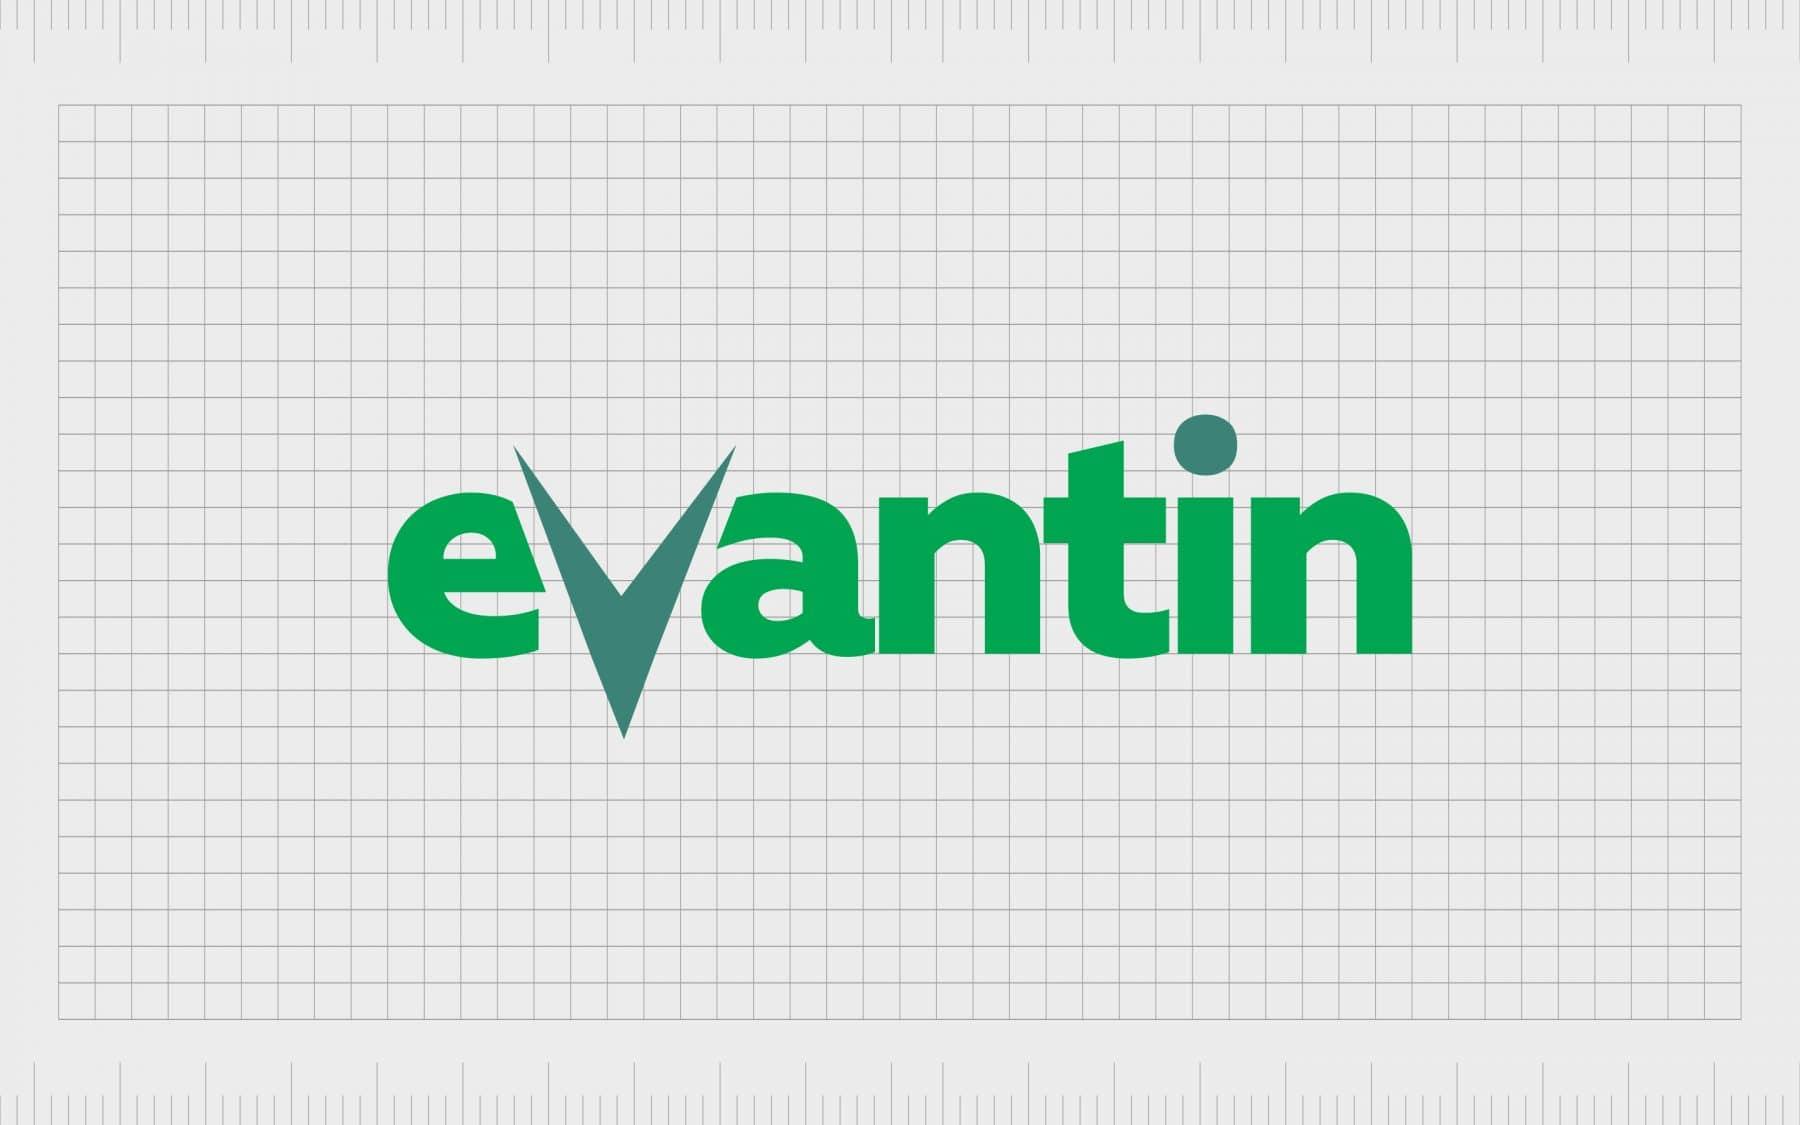 Evantin